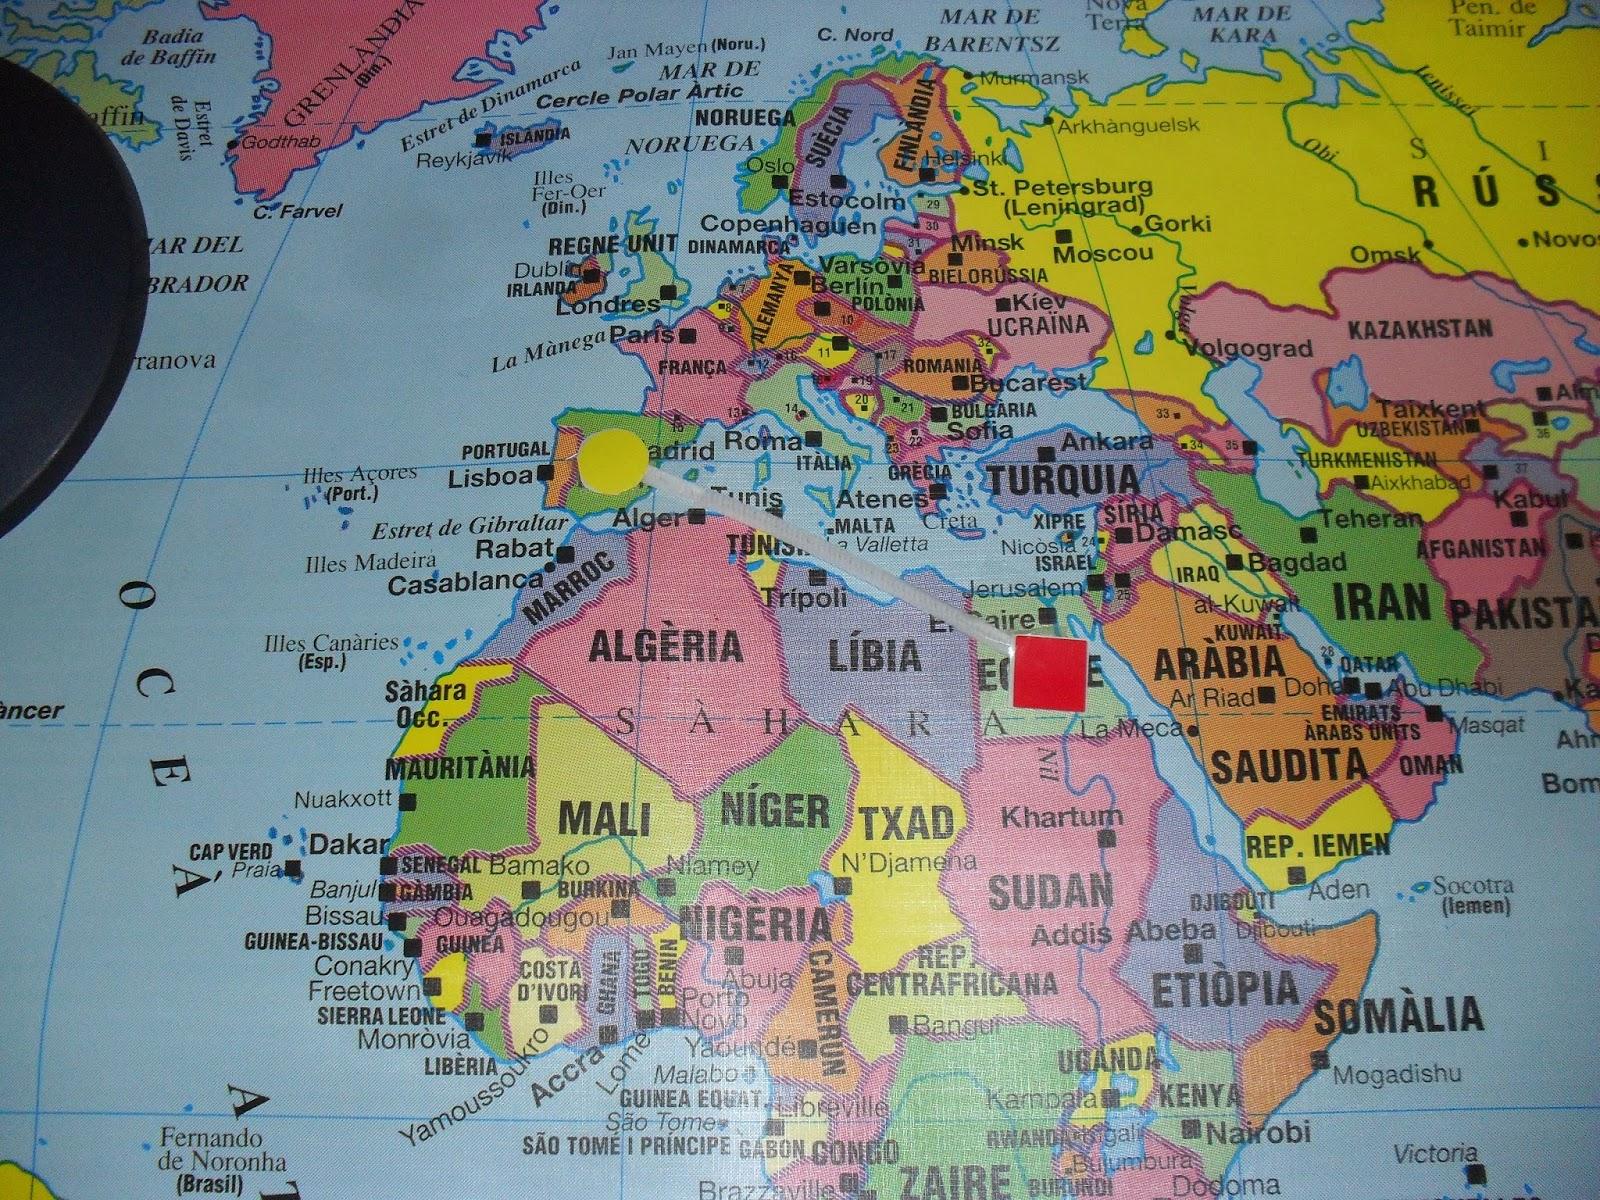 mapa mundo egipto Mapa Mundi Egipto mapa mundo egipto